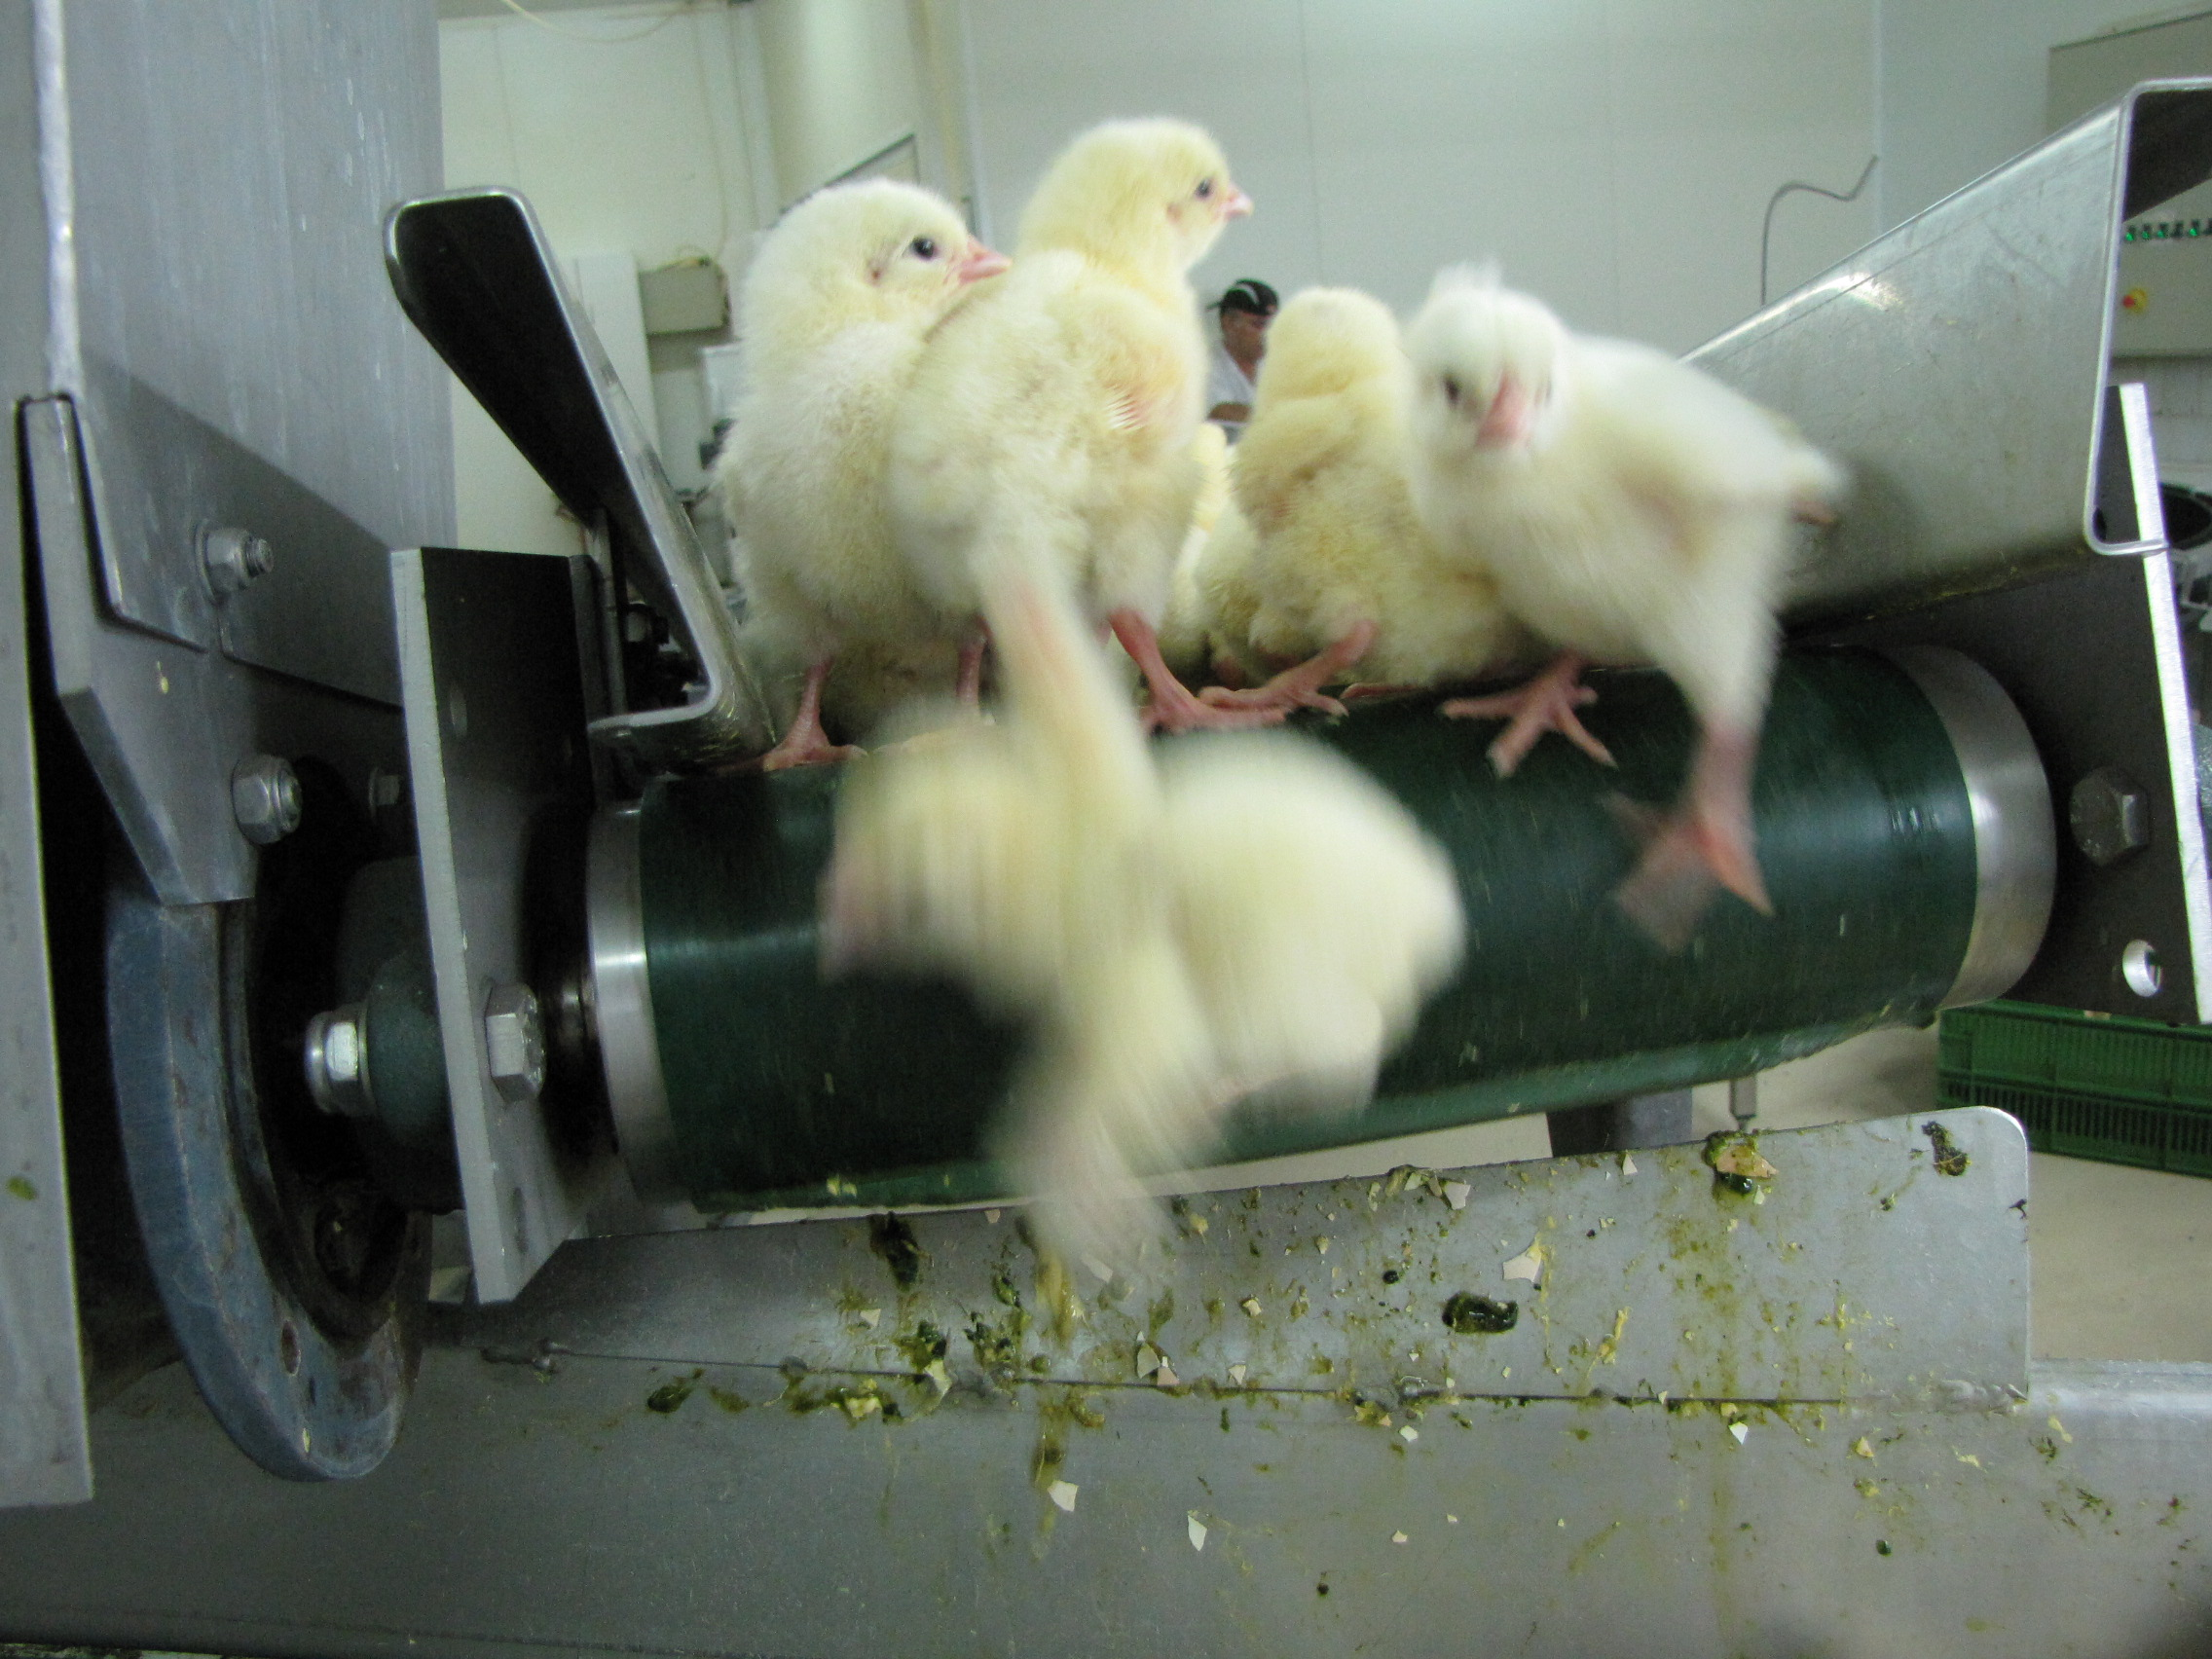 Switzerland bans culling